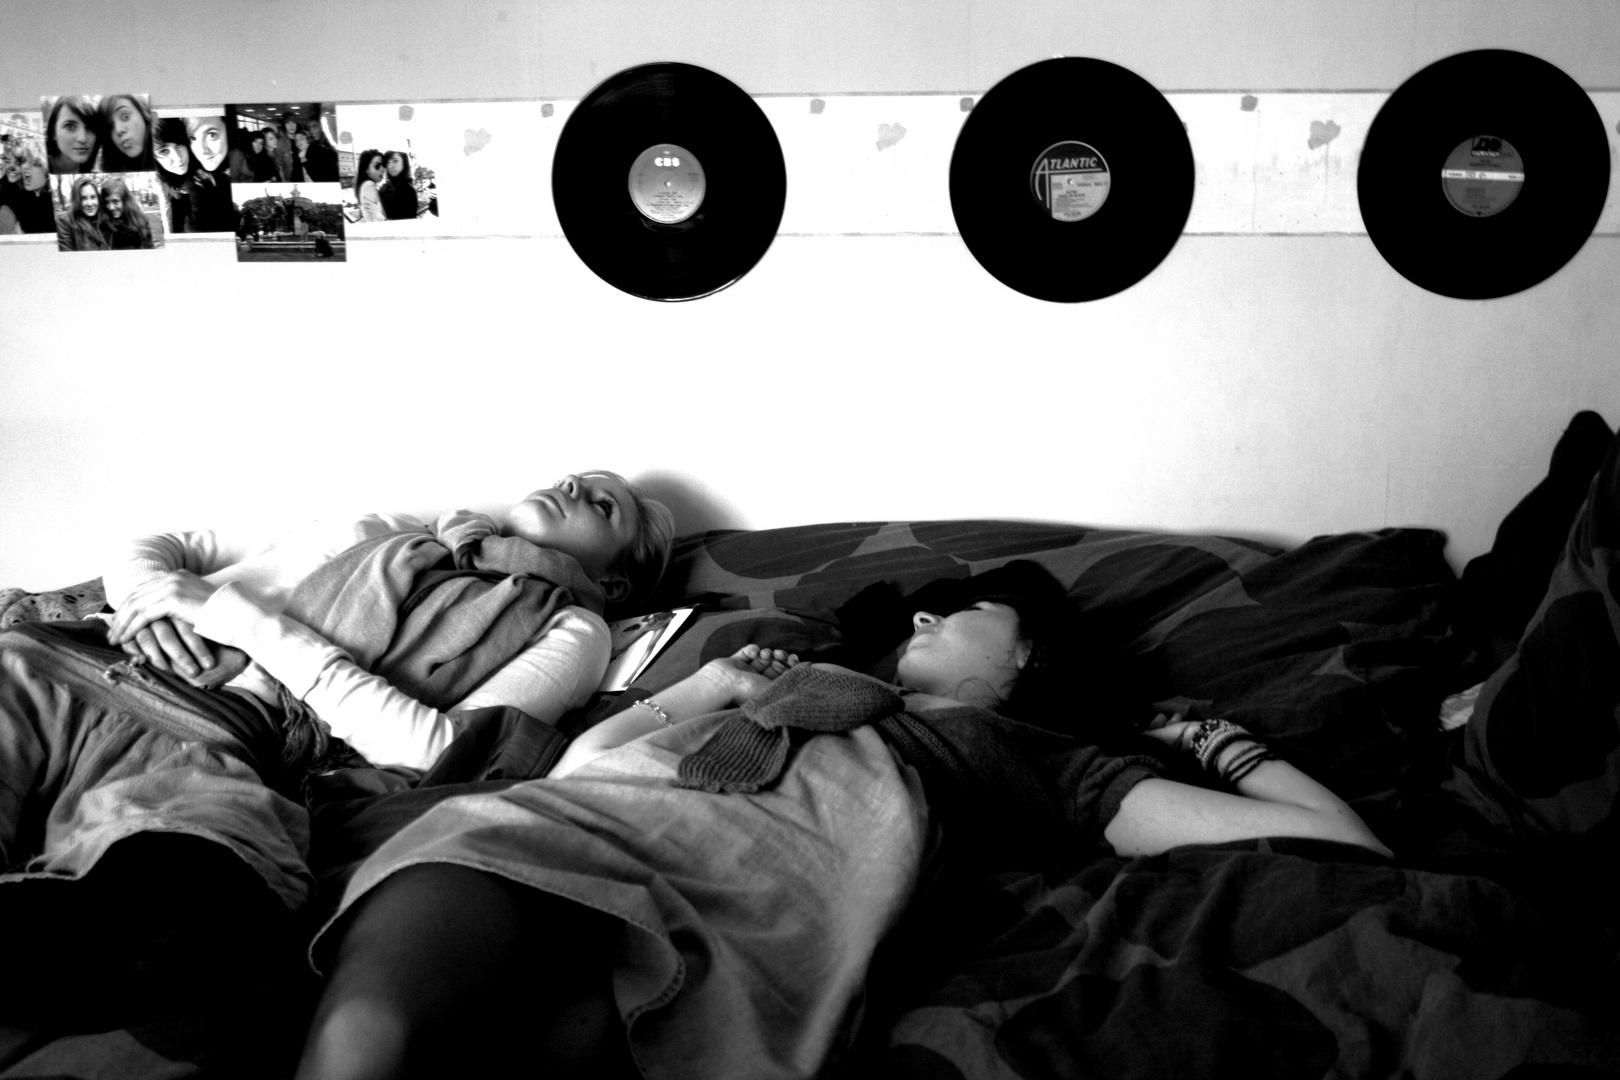 Vinyls & co